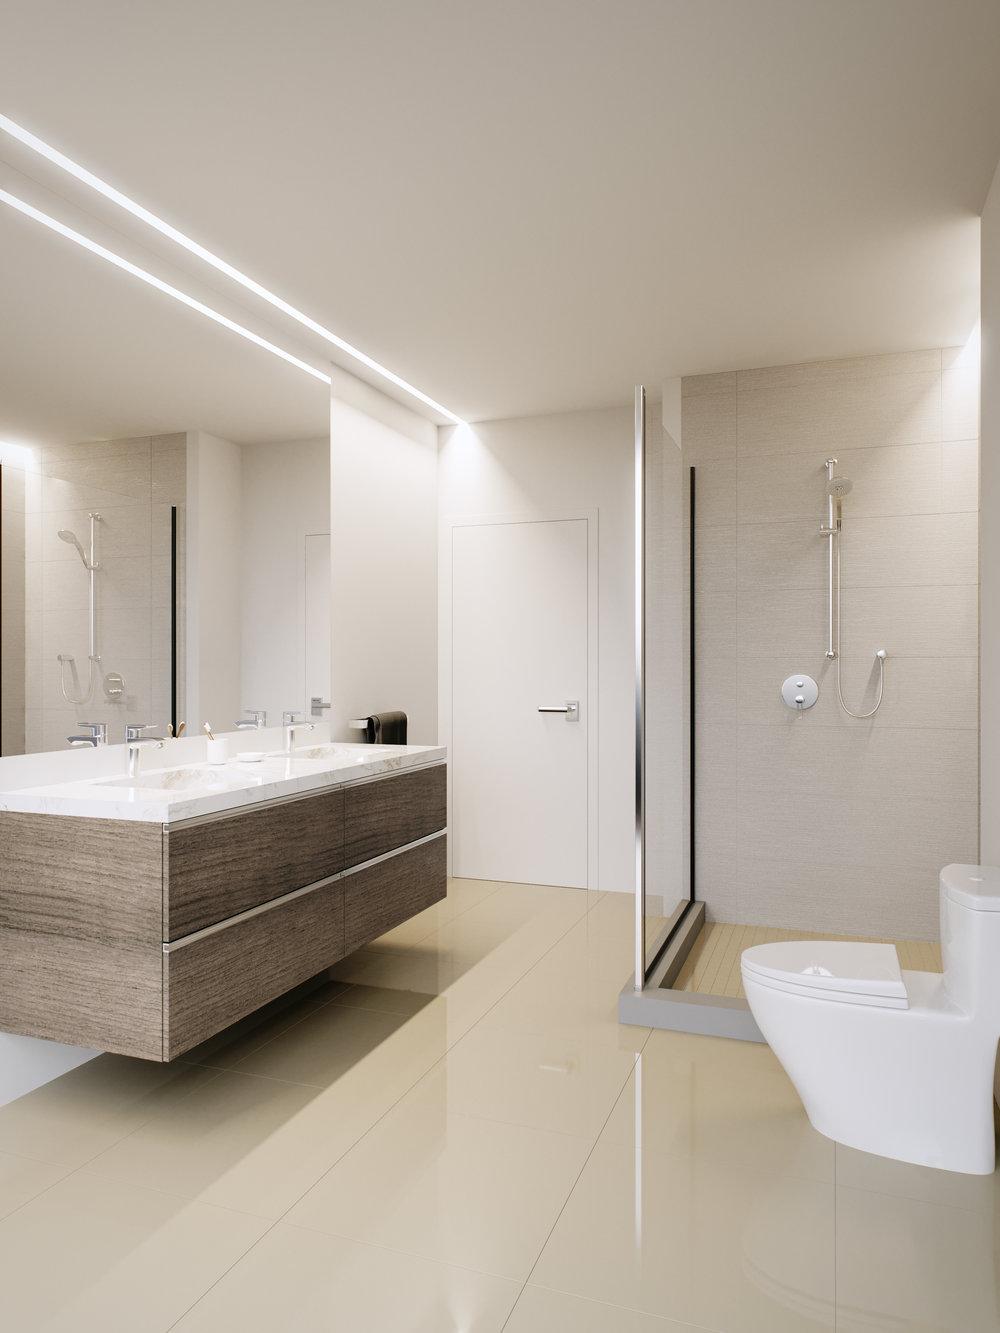 pacific-verde-luxury-plus-bath-c01_00000.jpg